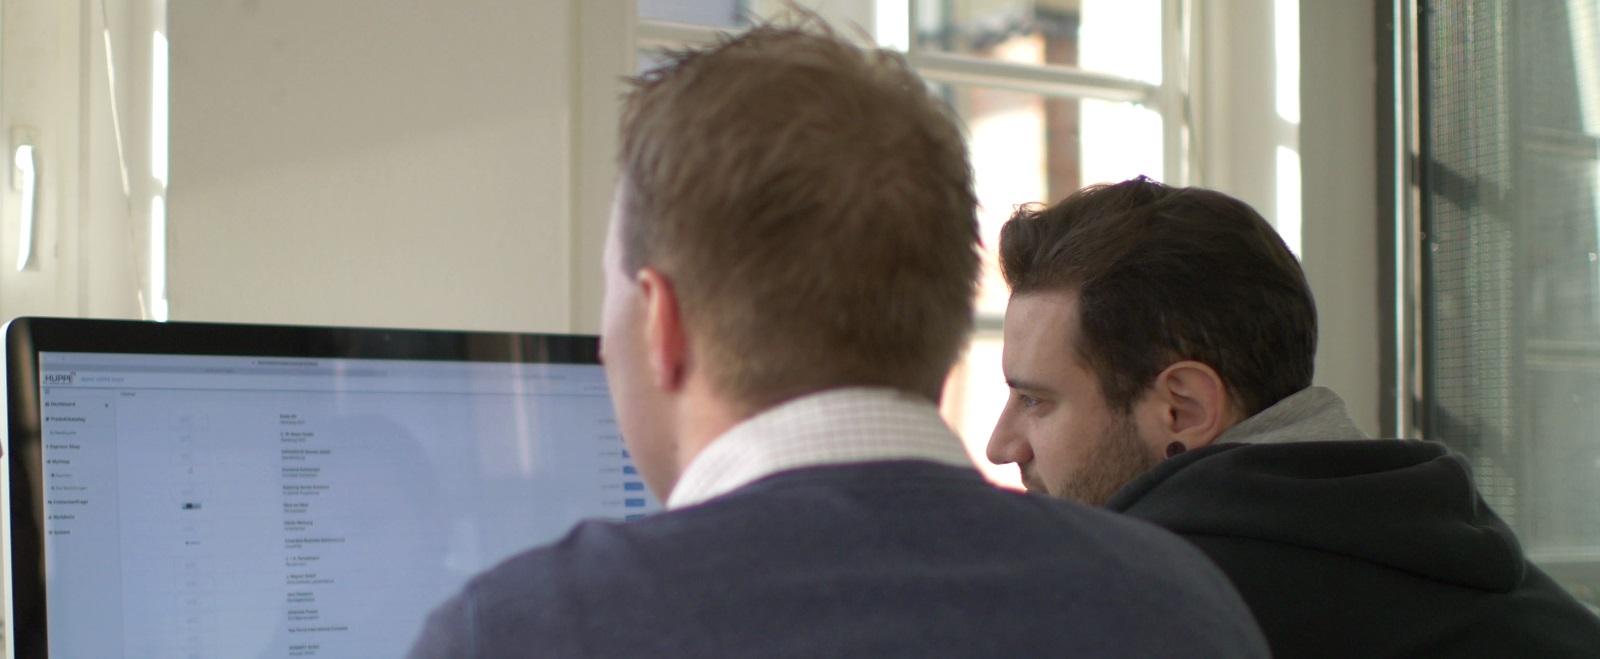 werkstudenten integra internet management gmbh